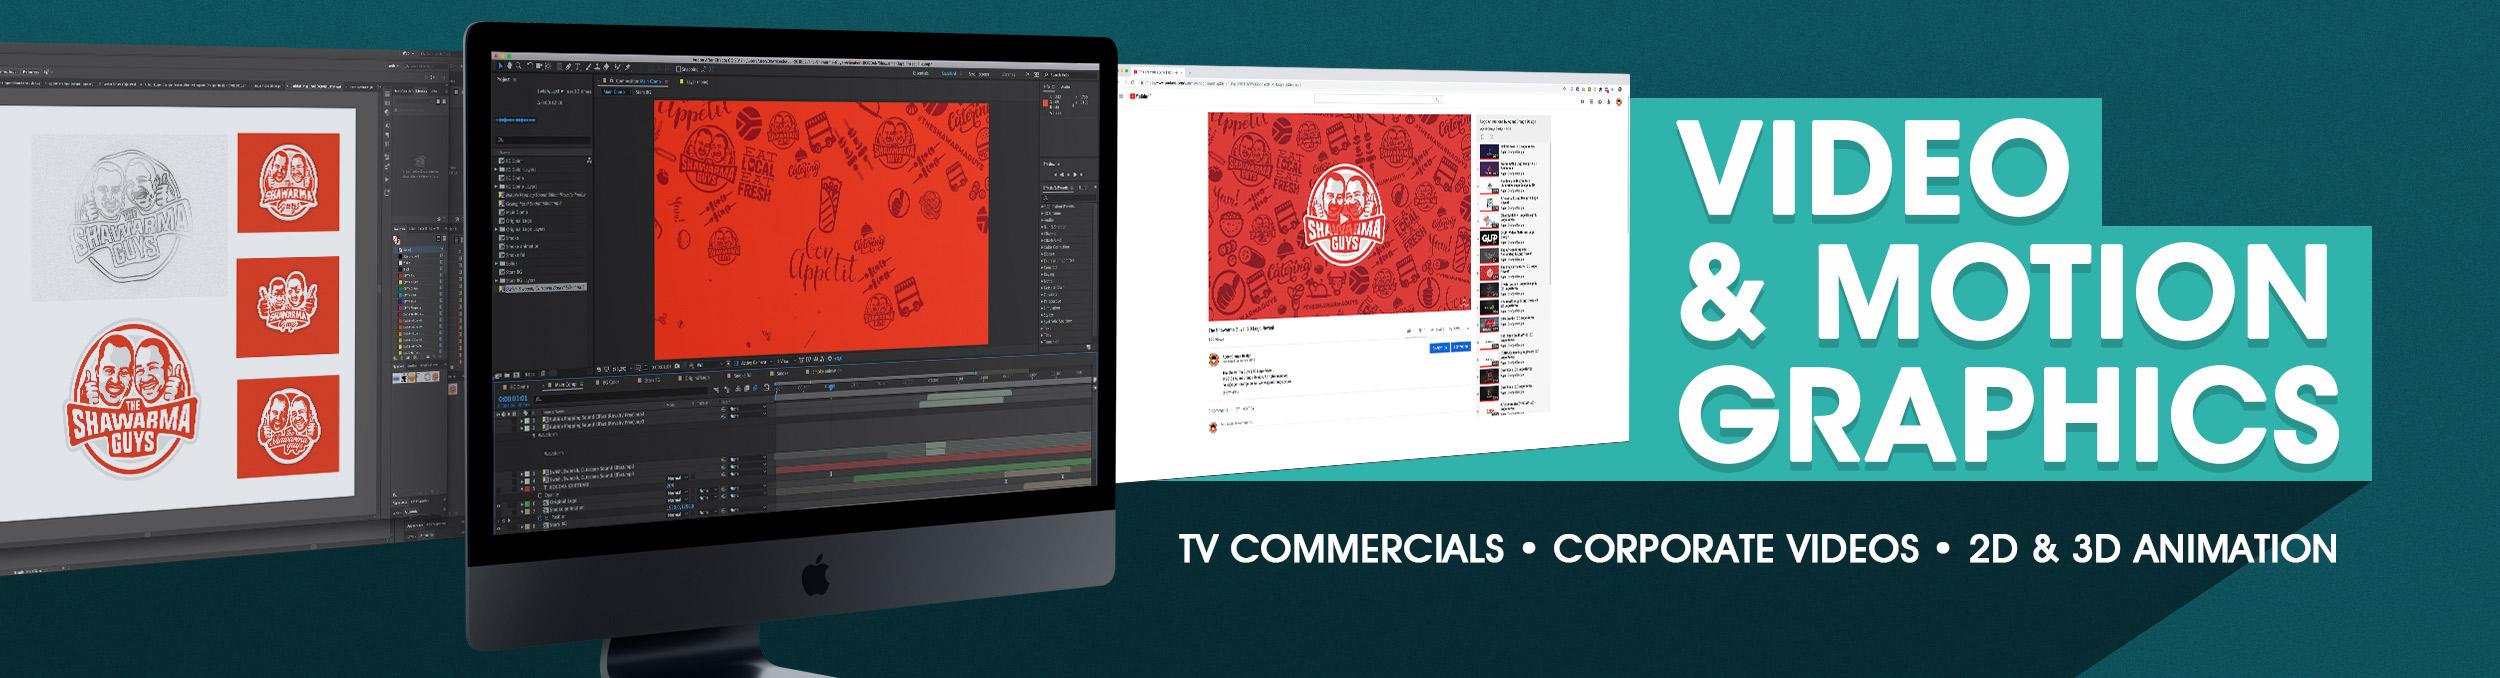 banner-video-motion-graphics-animation-company-johannesburg.jpg